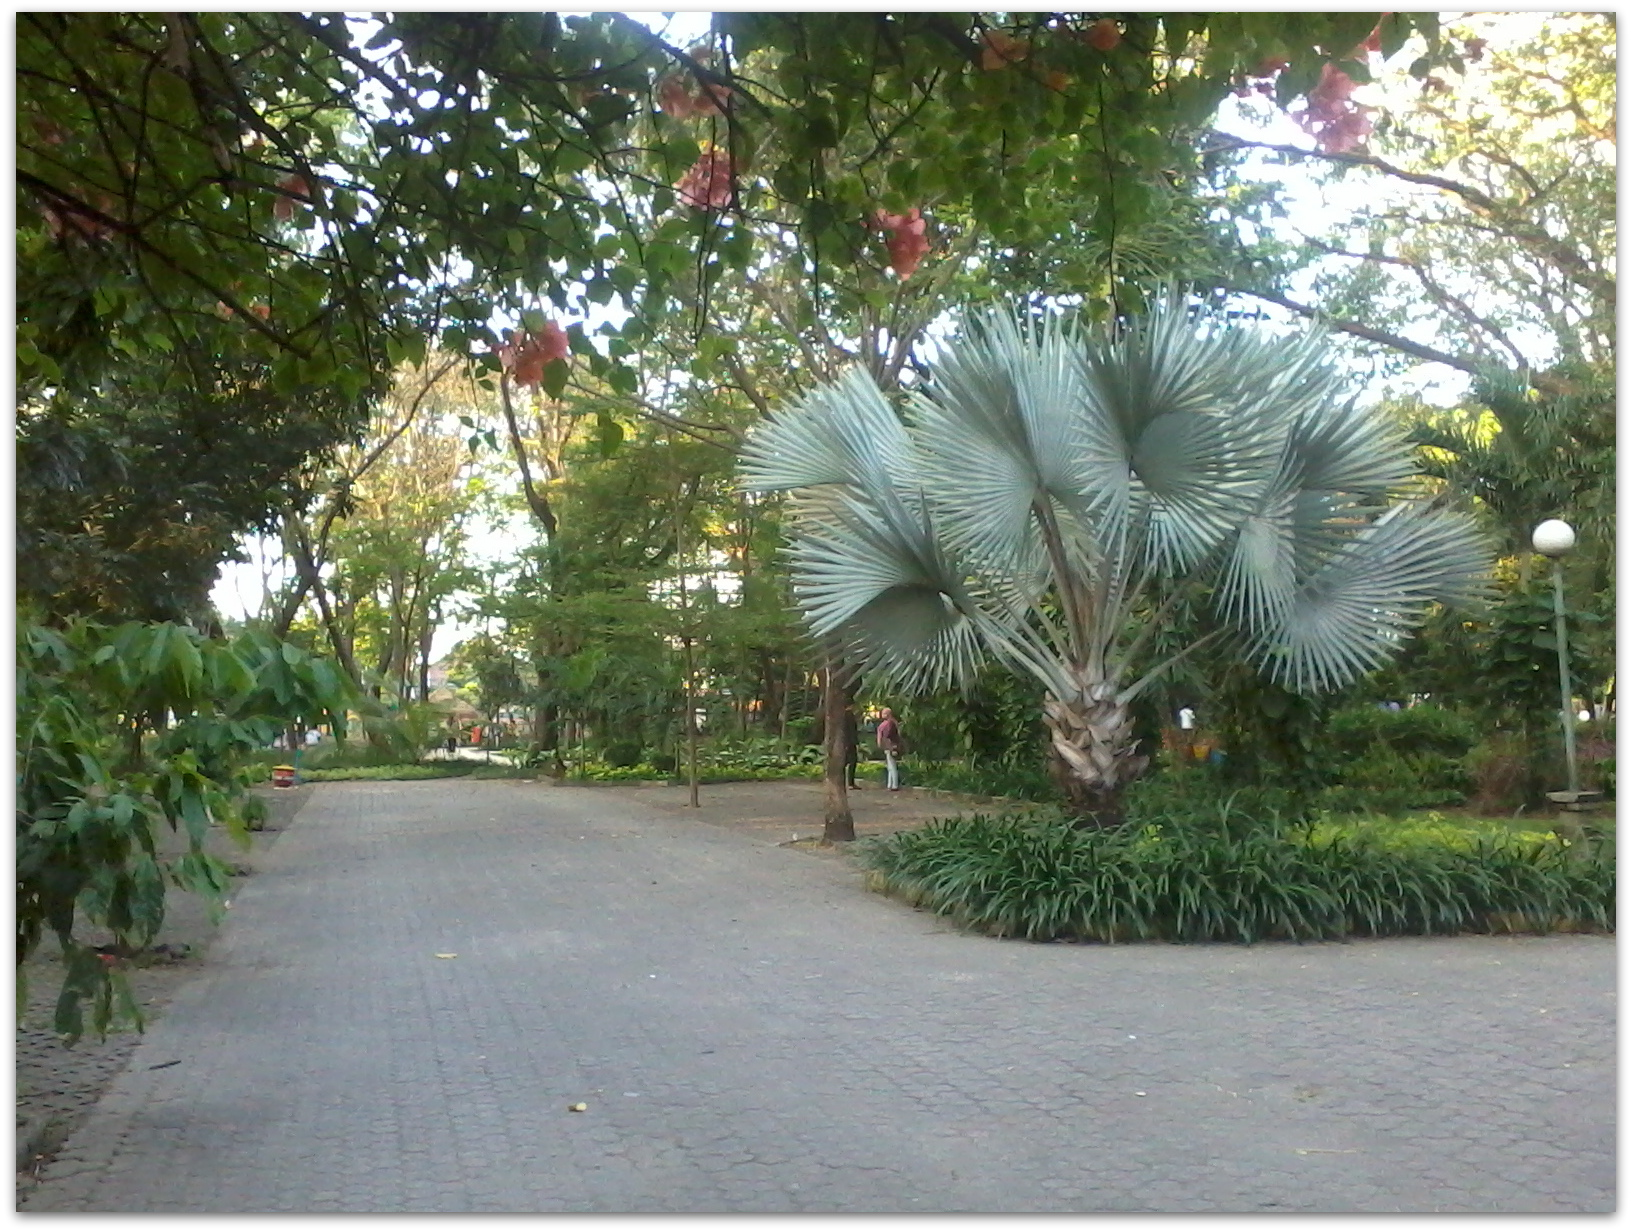 Taman Flora Kebun Bibit Bratang Surabaya Dream Terletak Jalan Lokasinya